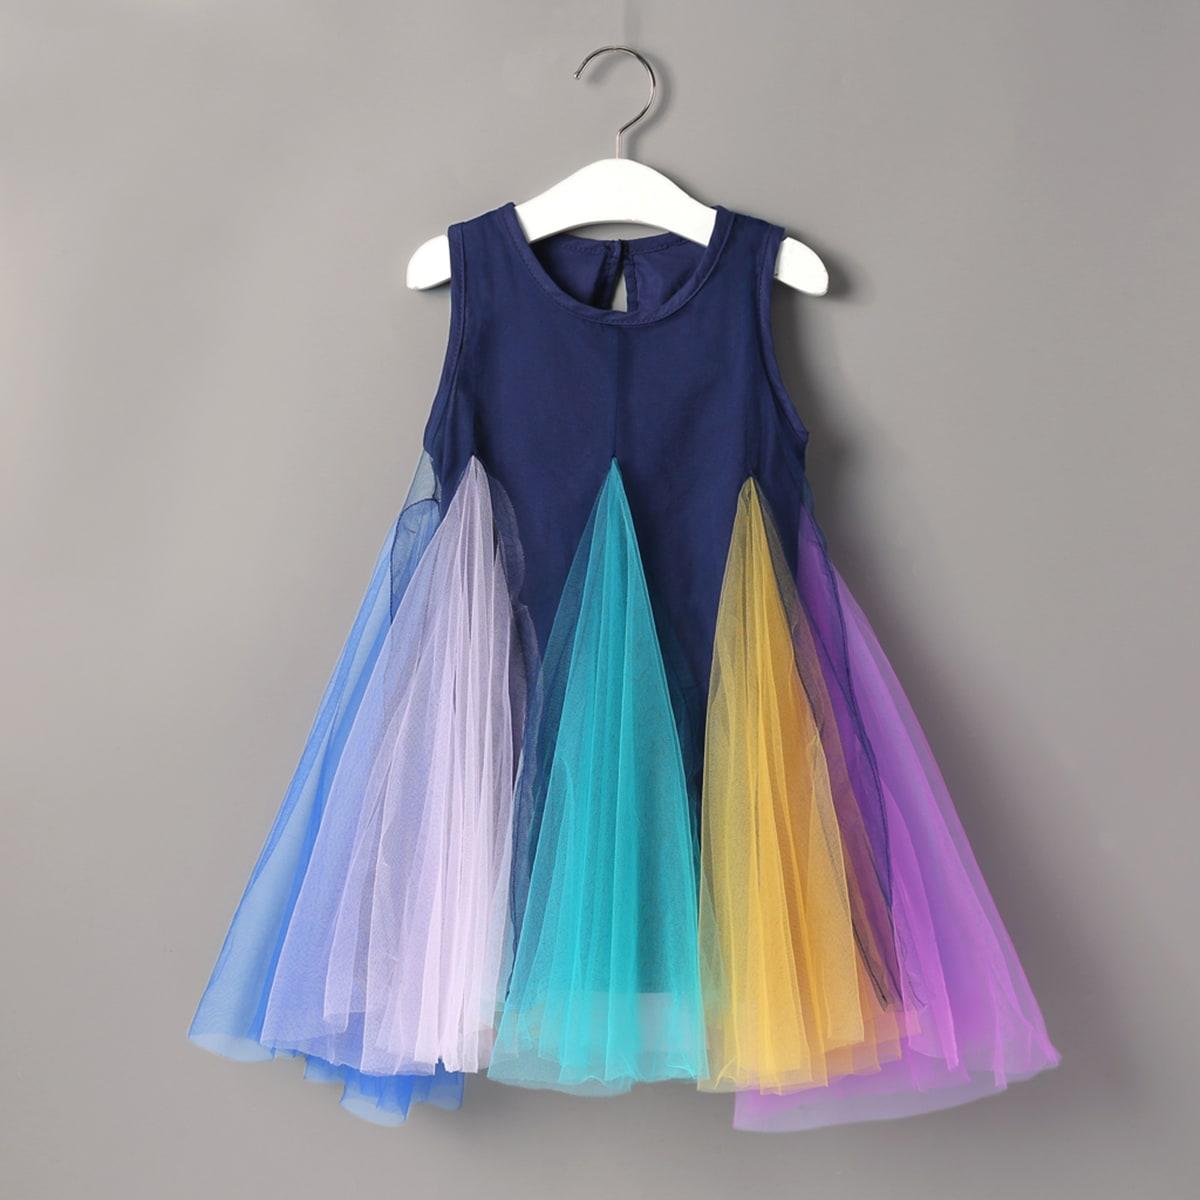 SHEIN / Toddler Girls Colorful Mesh Godet Panel A-line Dress